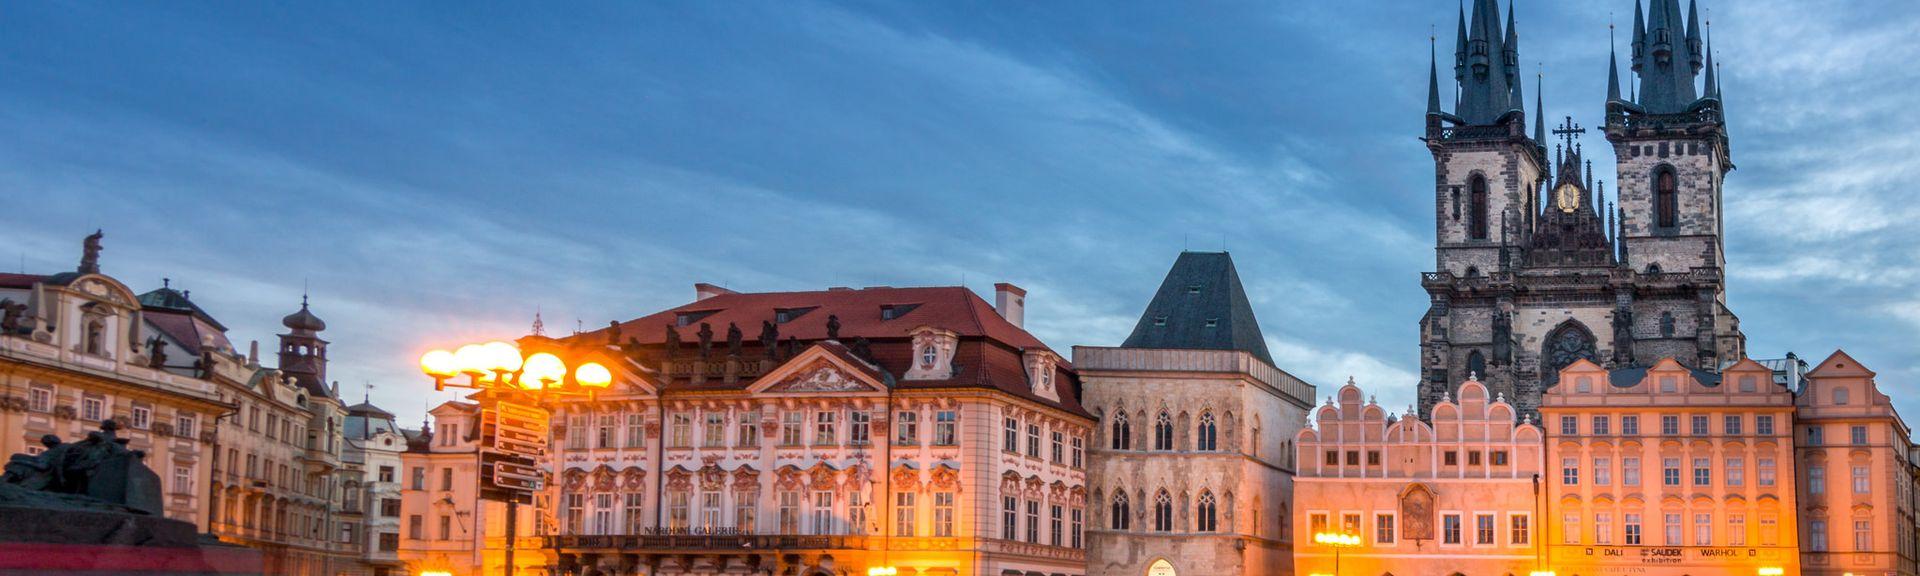 Hradcany, Prague, Prague (region), Czech Republic